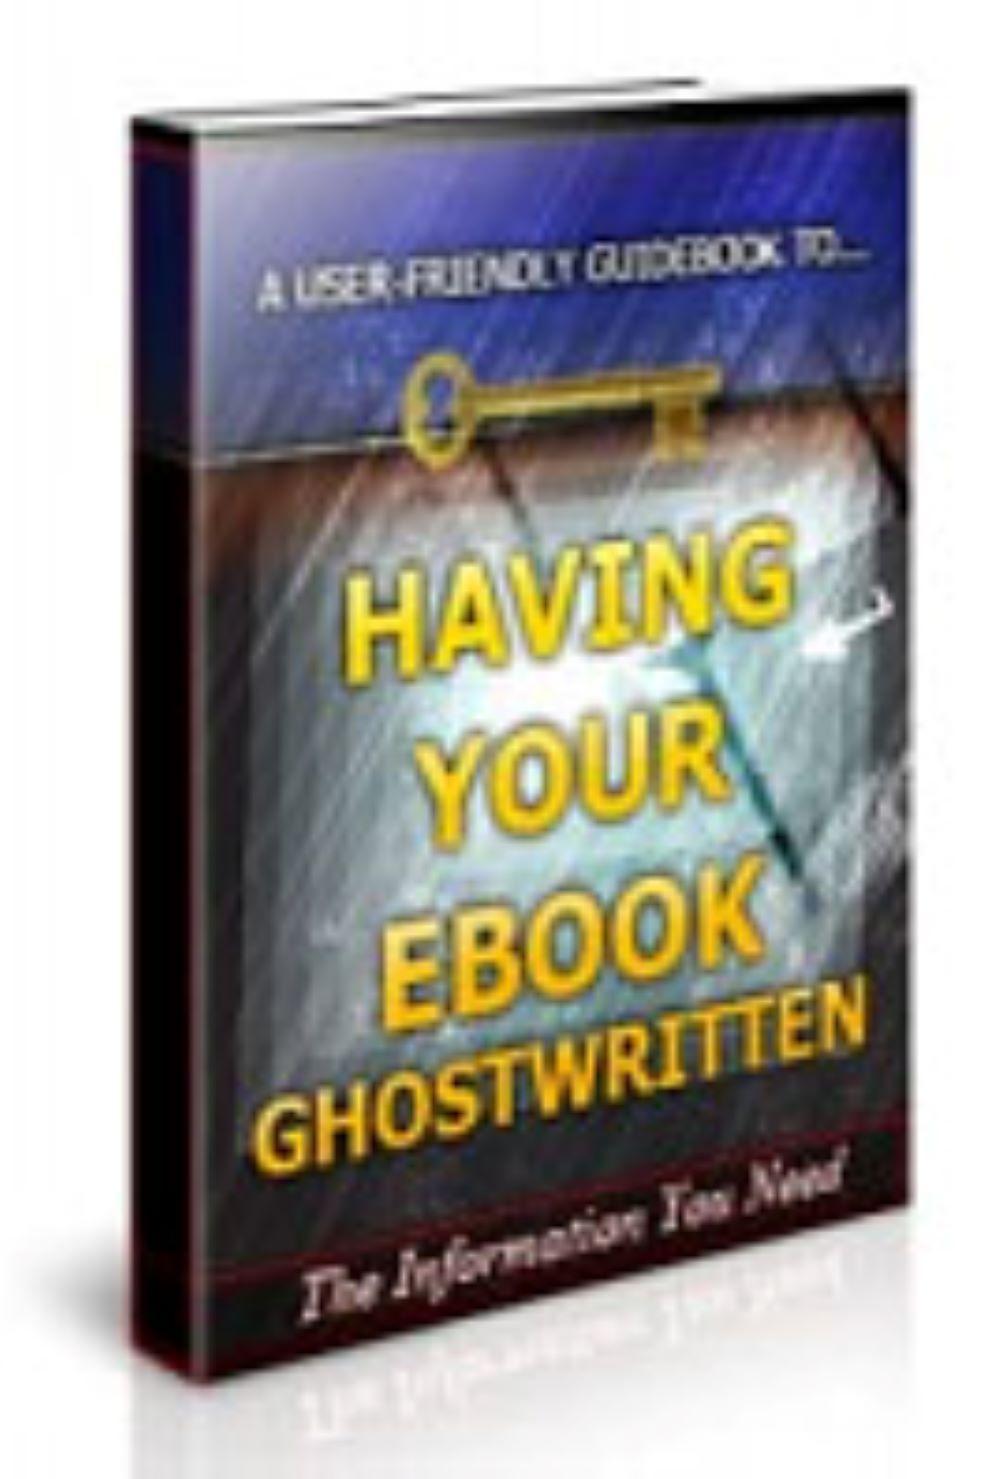 Having Your Ebook Ghostwritten